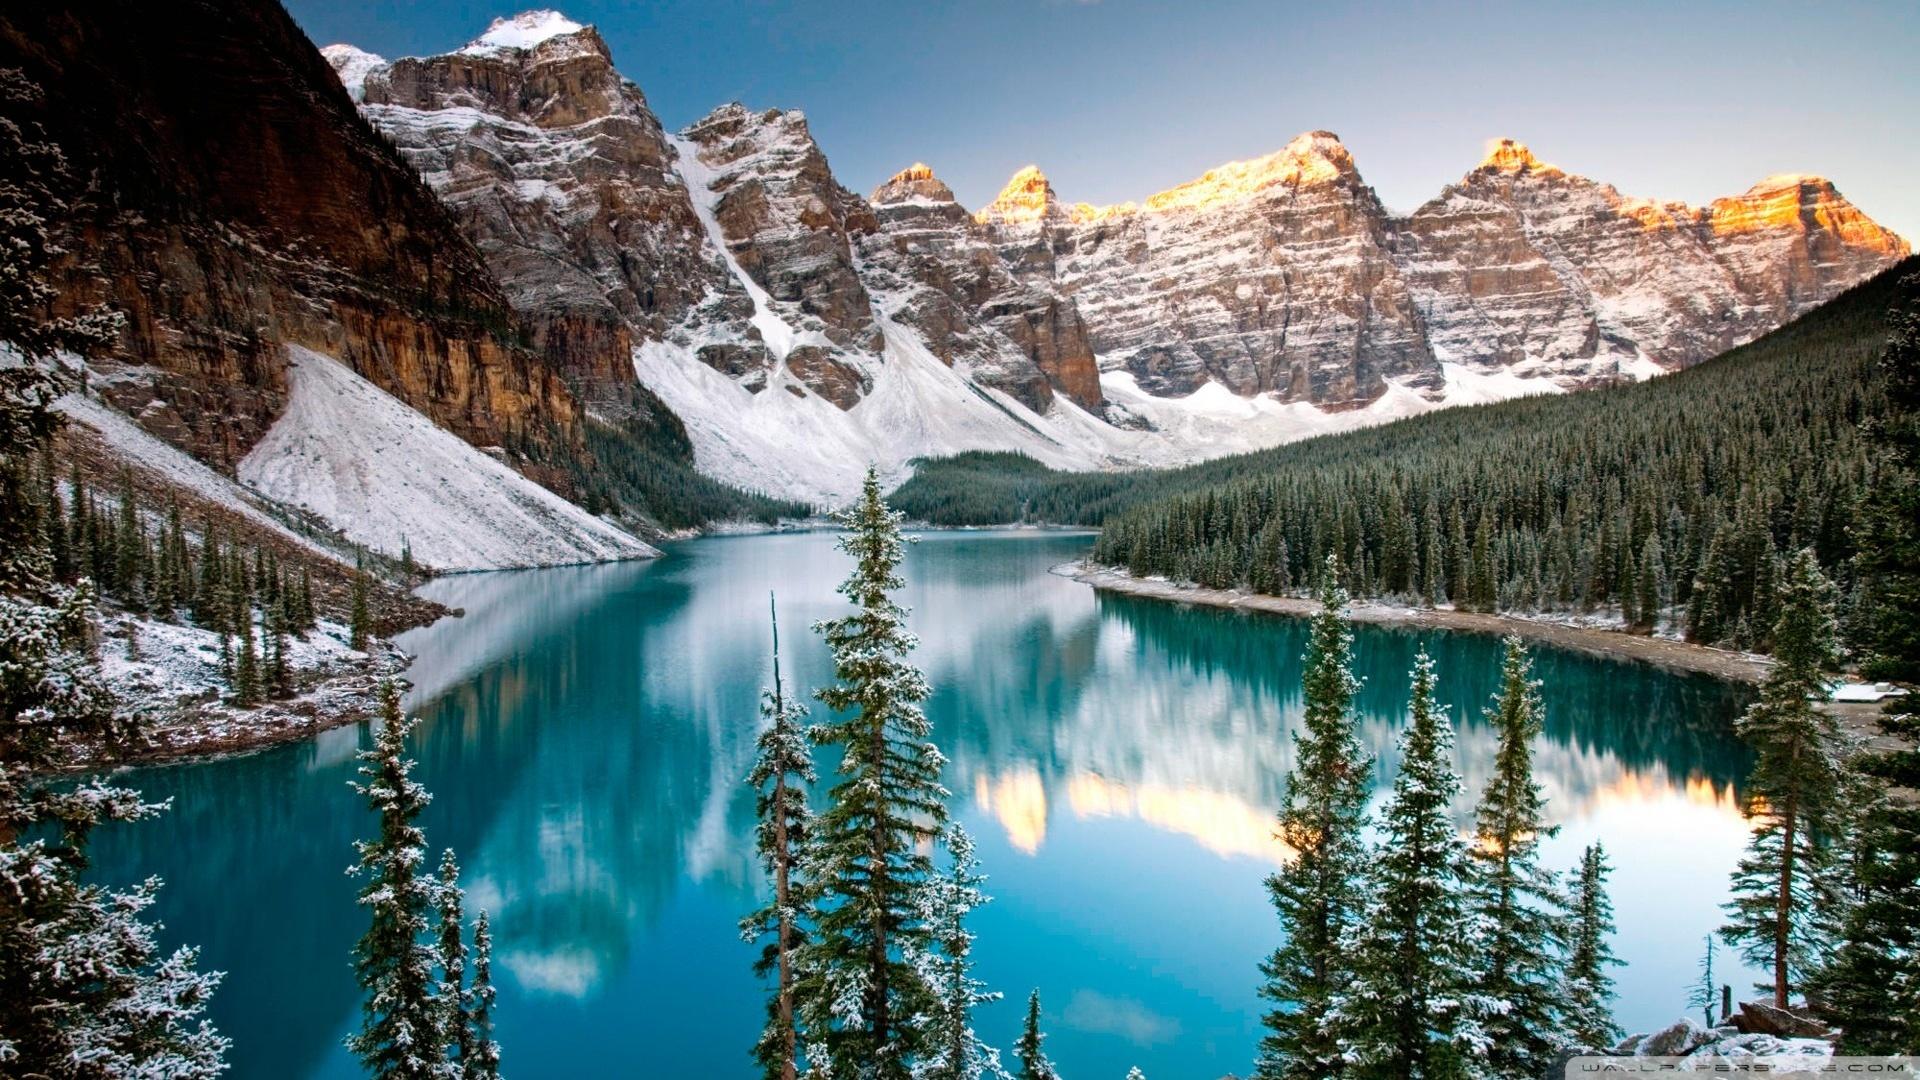 Alberta Canada Wallpaper 1920x1080 Winter Moraine Lake Alberta 1920x1080